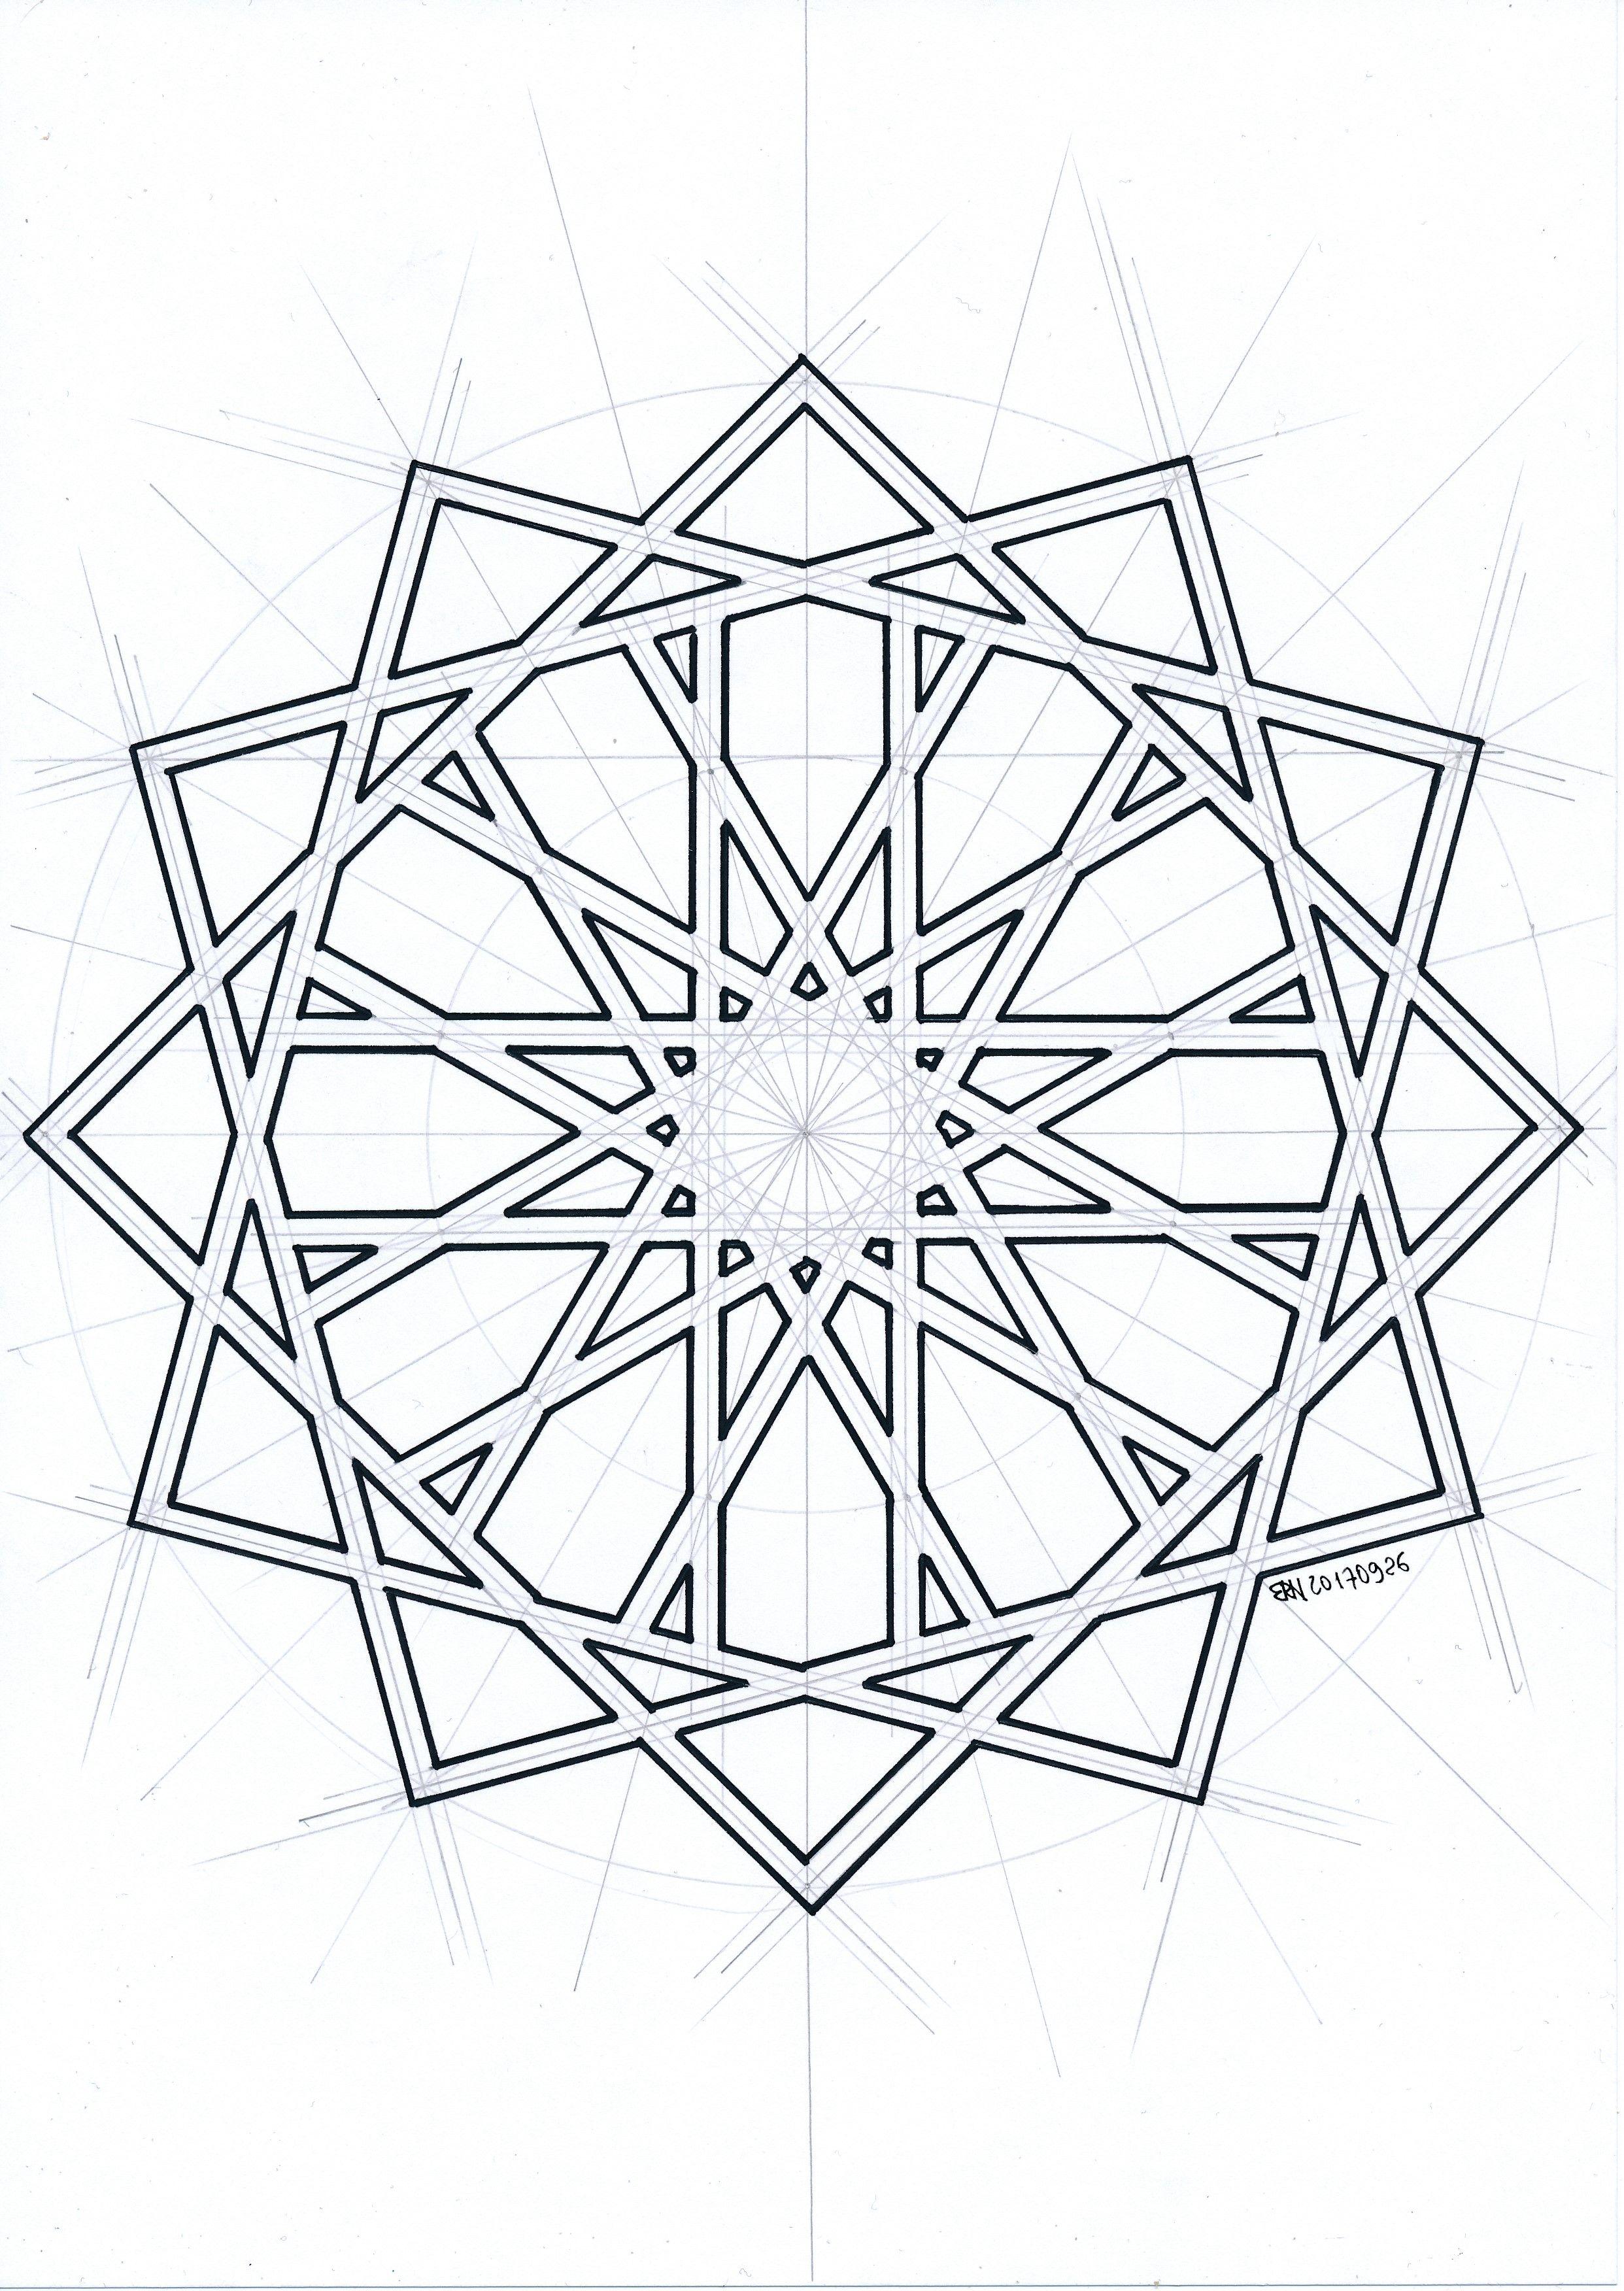 #islamicdesign #islamicpattern #islamicart #arabianart #